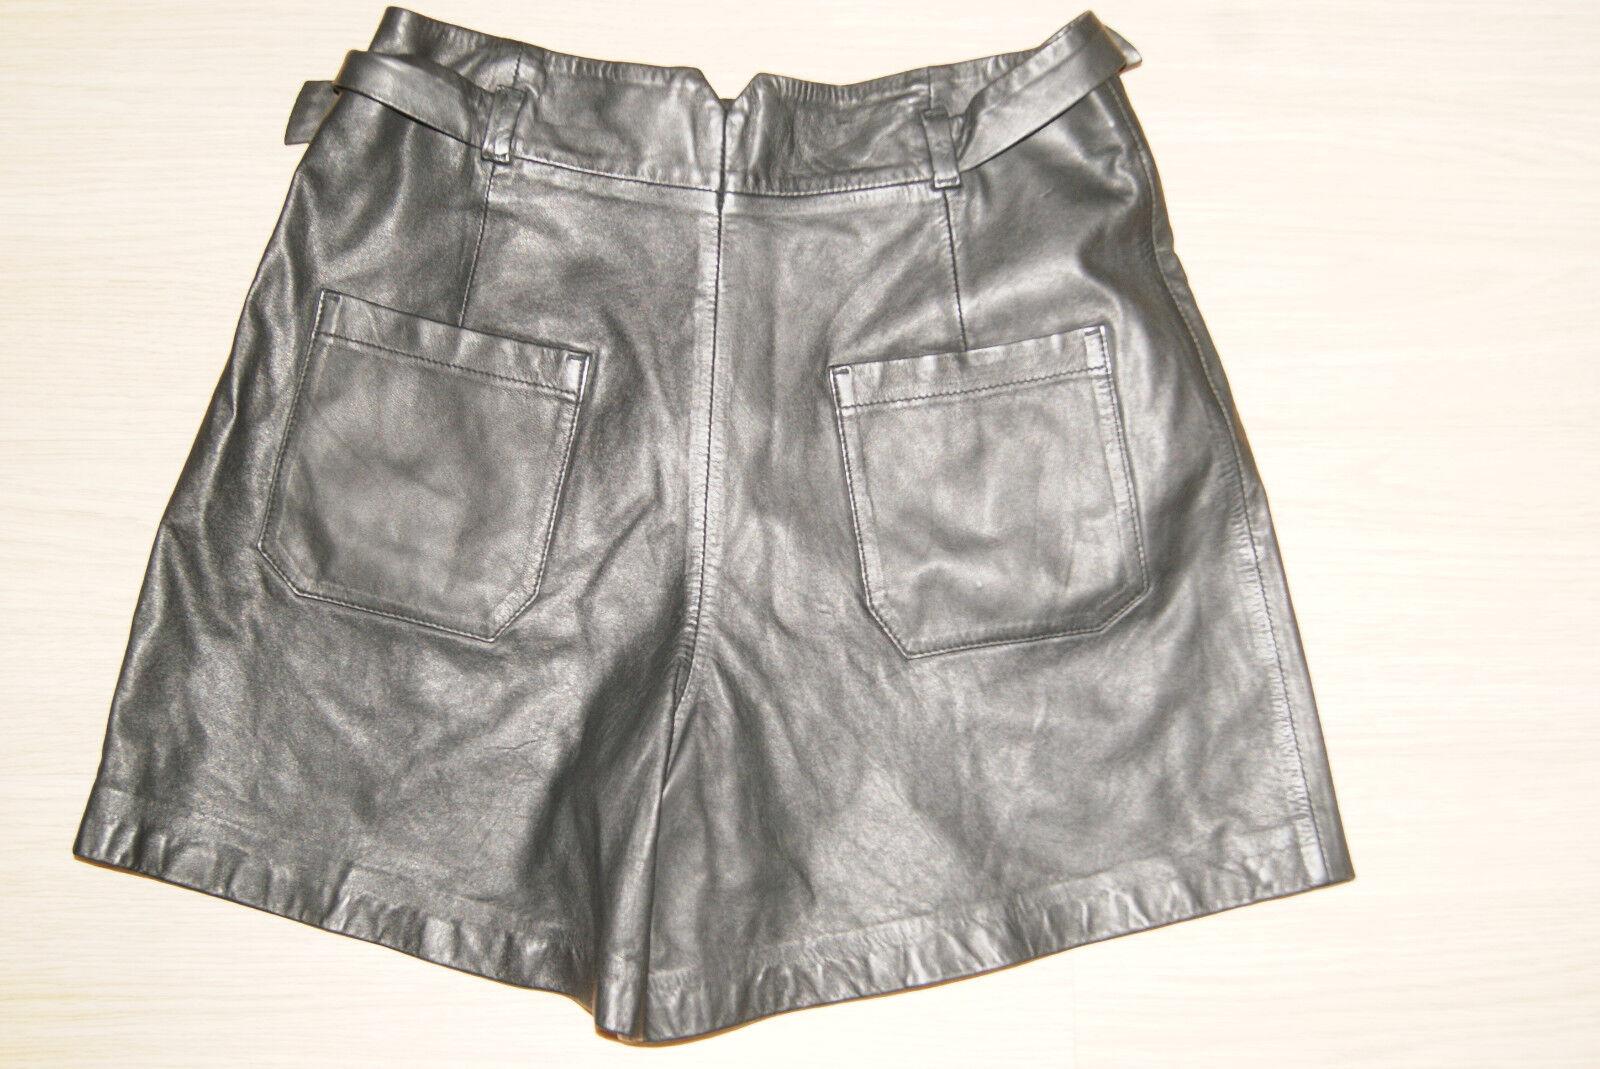 SET Lederhose Gr. 38 M M M OUISET Oui schwarz Ledershorts Bermuda kurz Shorts NEU | Vielfalt  7236e0